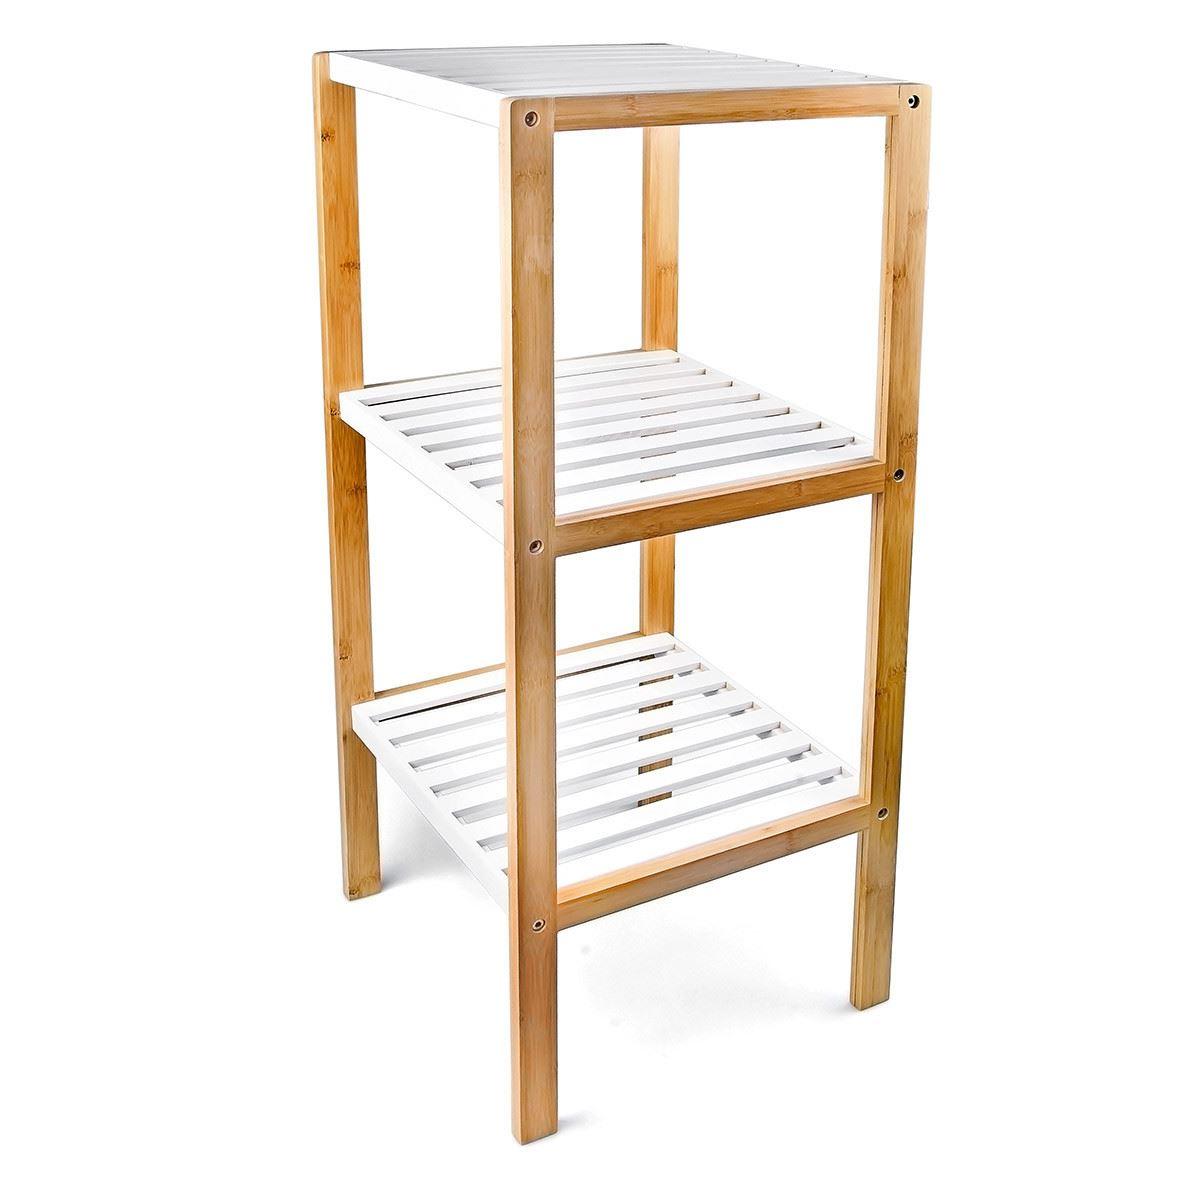 3/4 Tier Freestanding Bamboo Bathroom Storage Unit Shelf ...